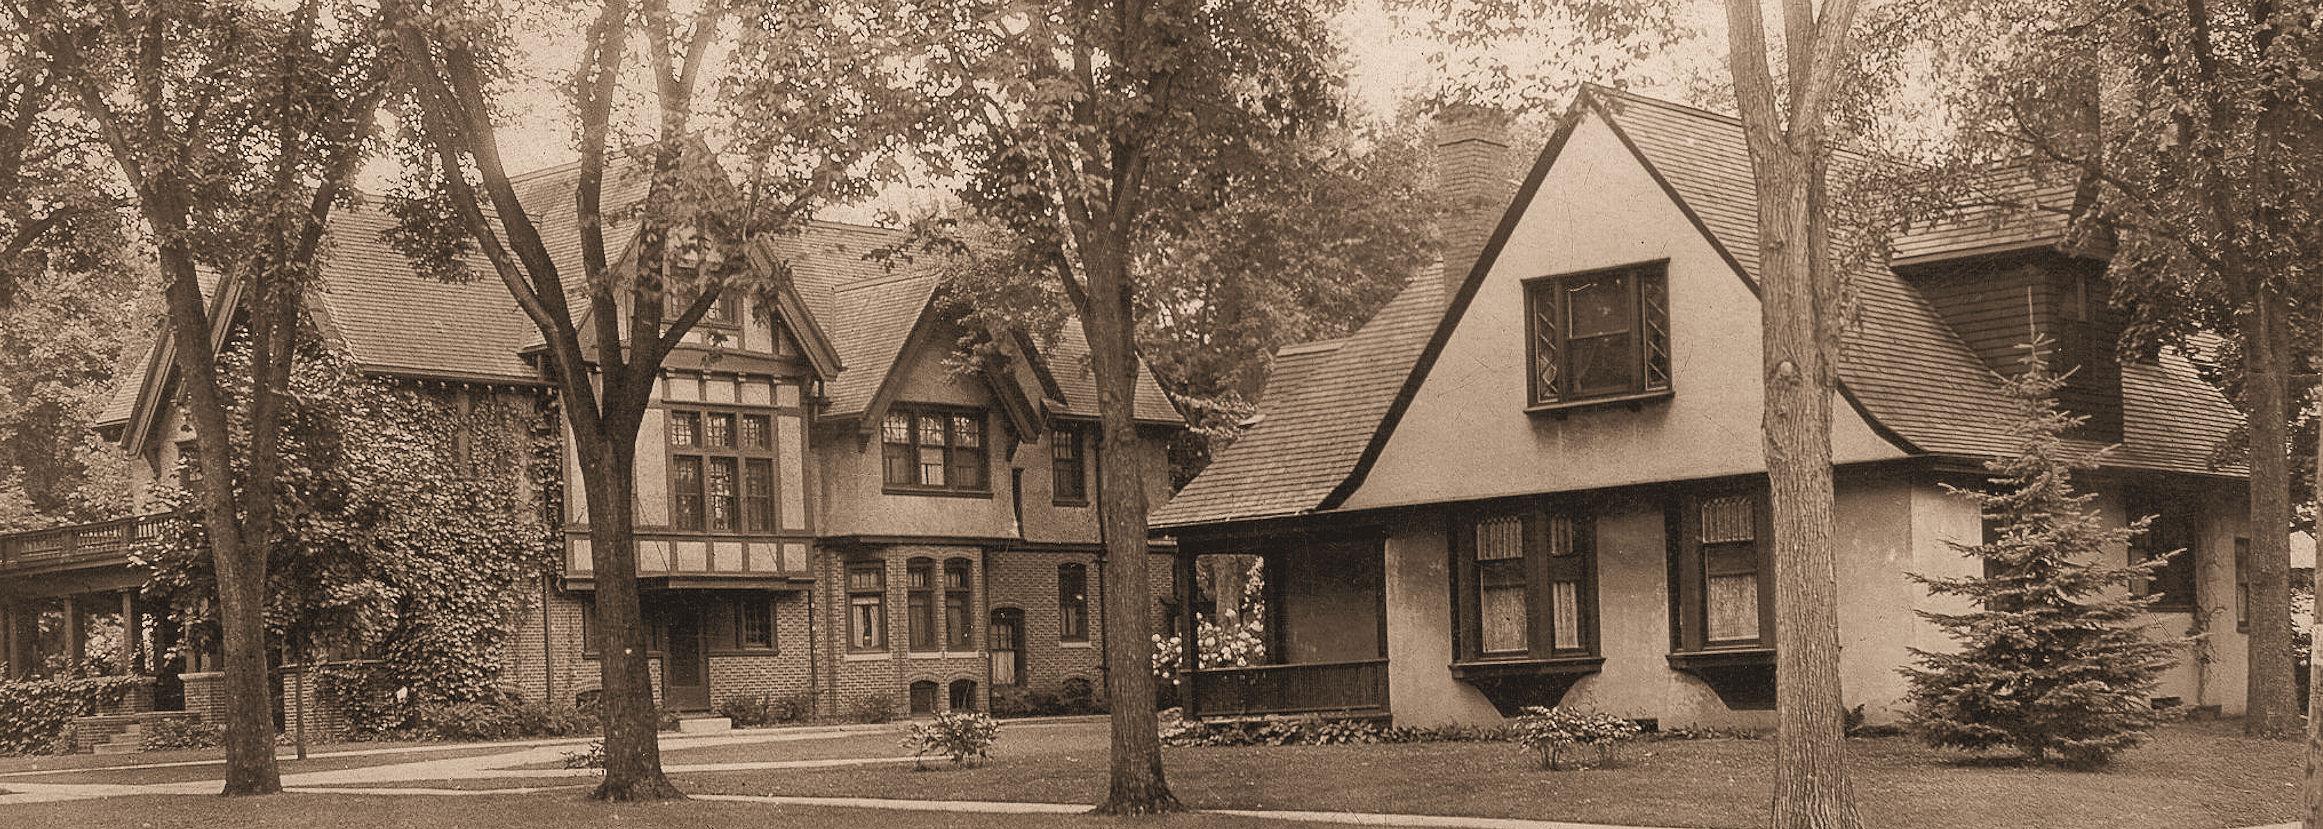 Jane Van Orden cottage 1897, at right